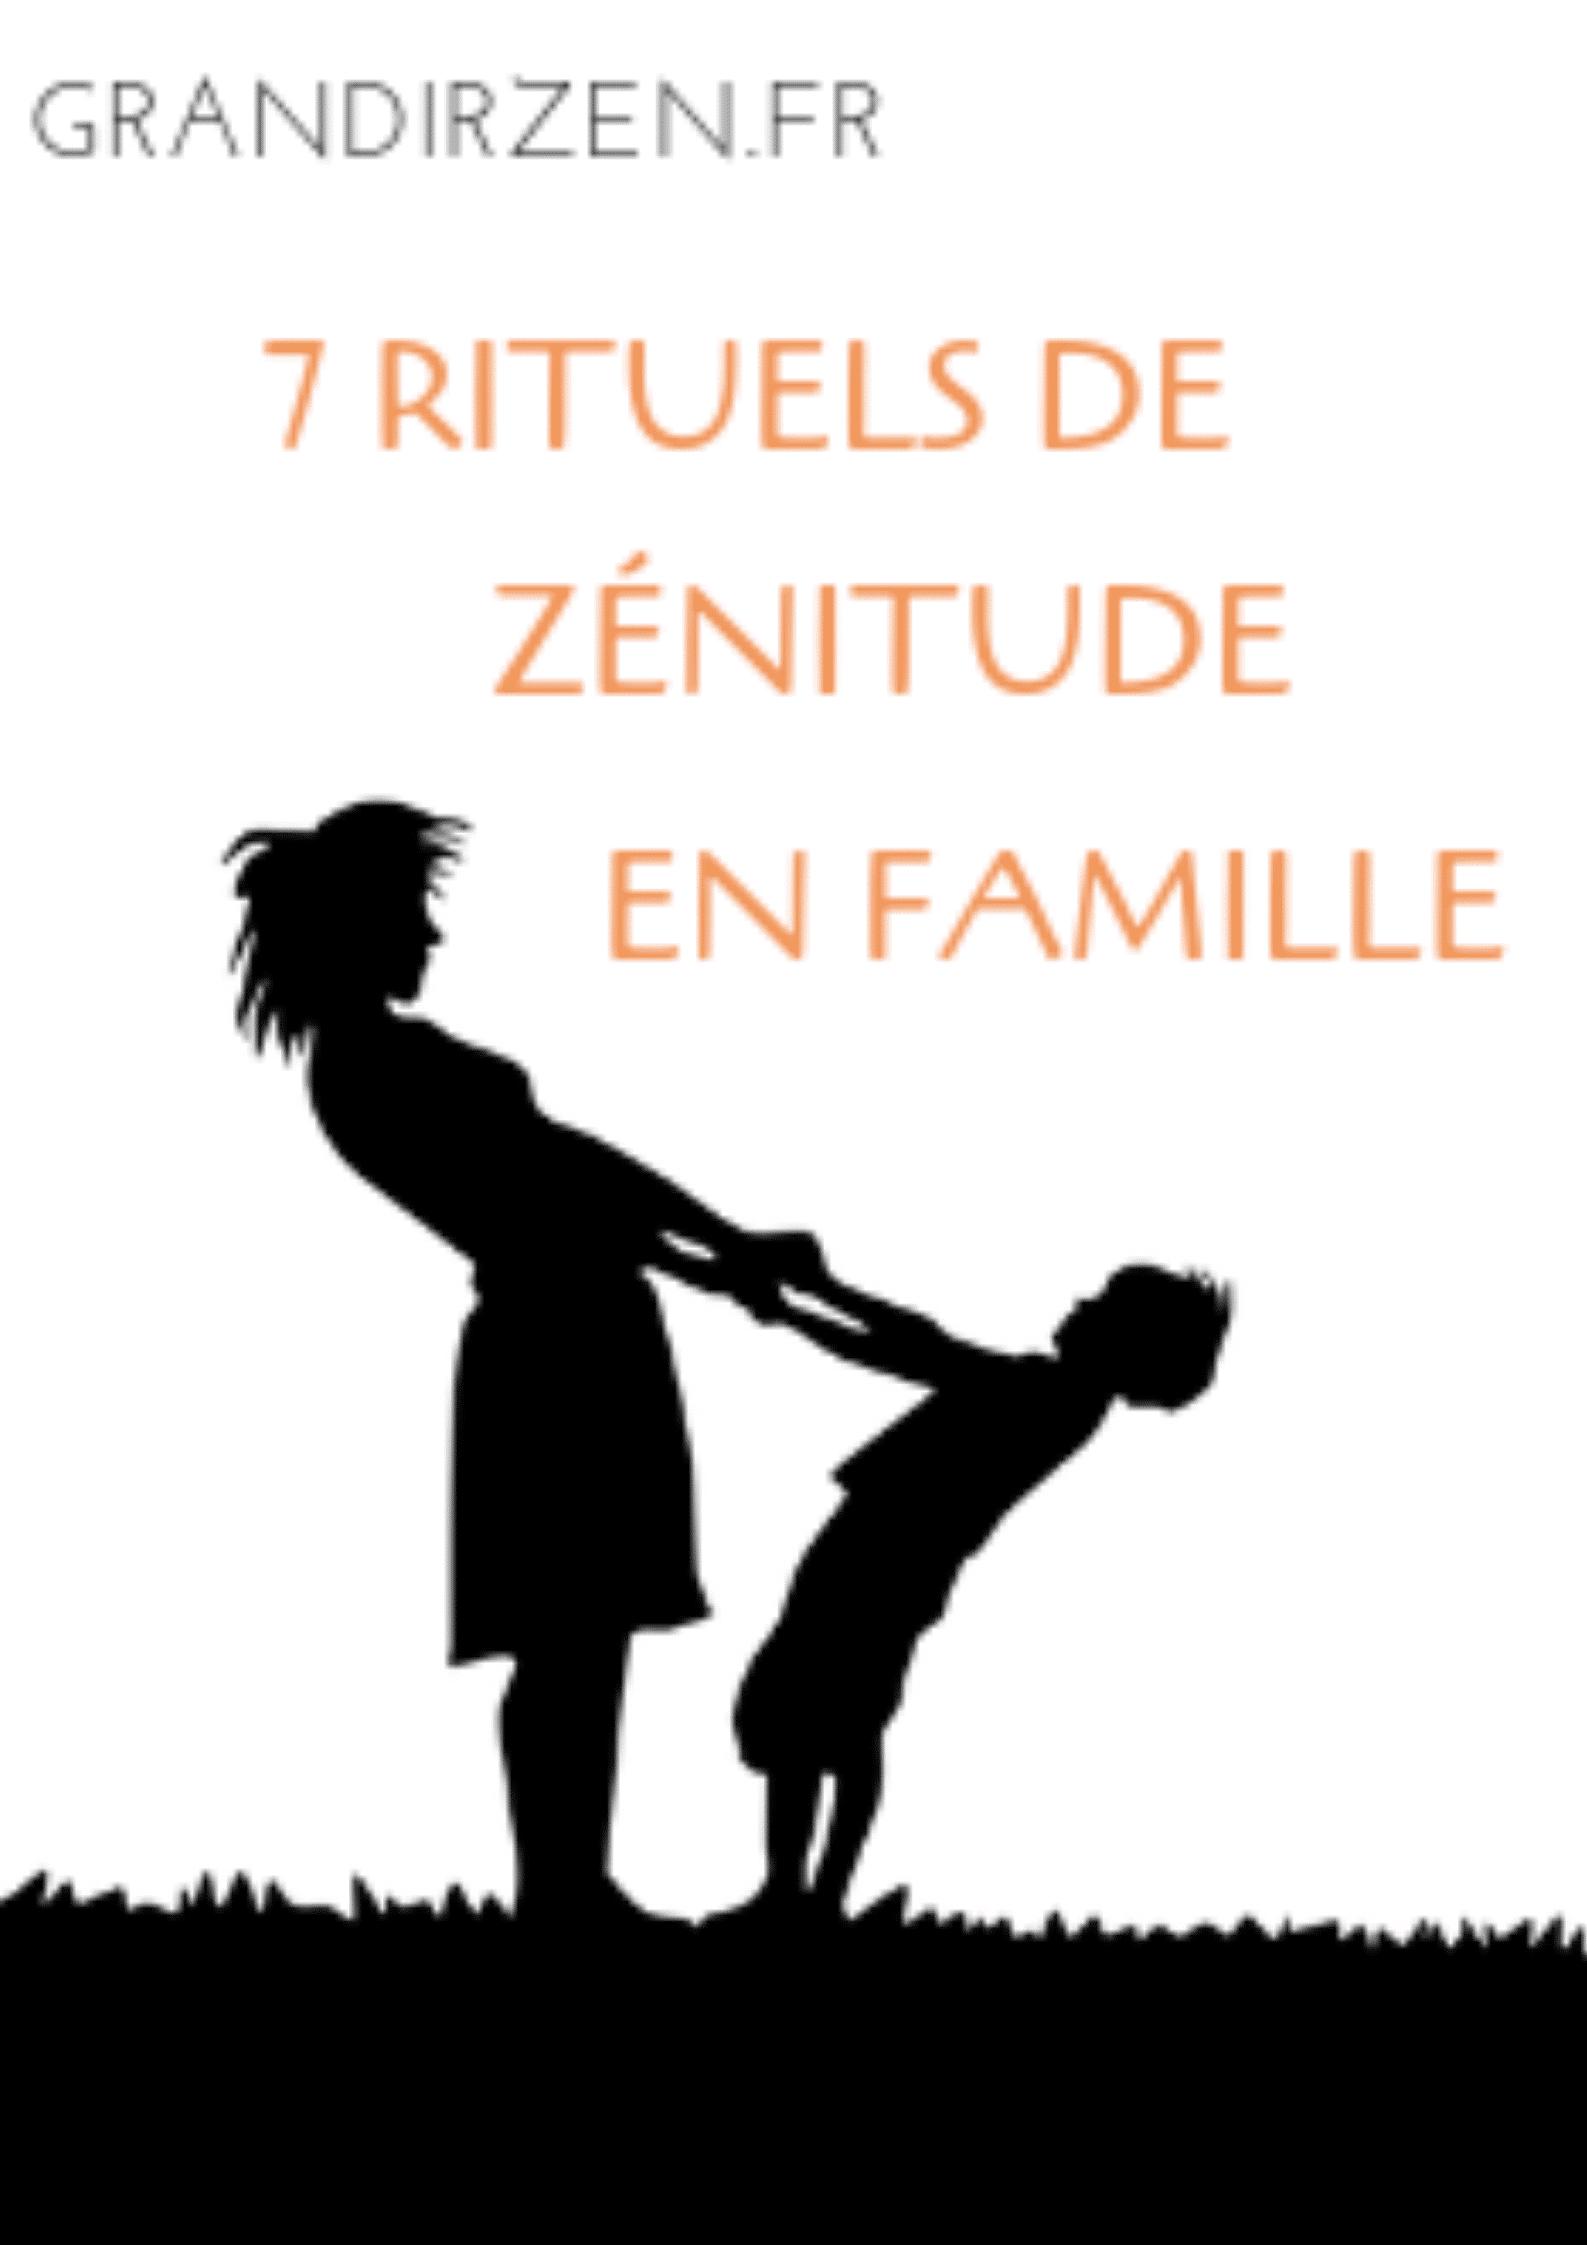 7-rituels-enfant-zen-formatvertical